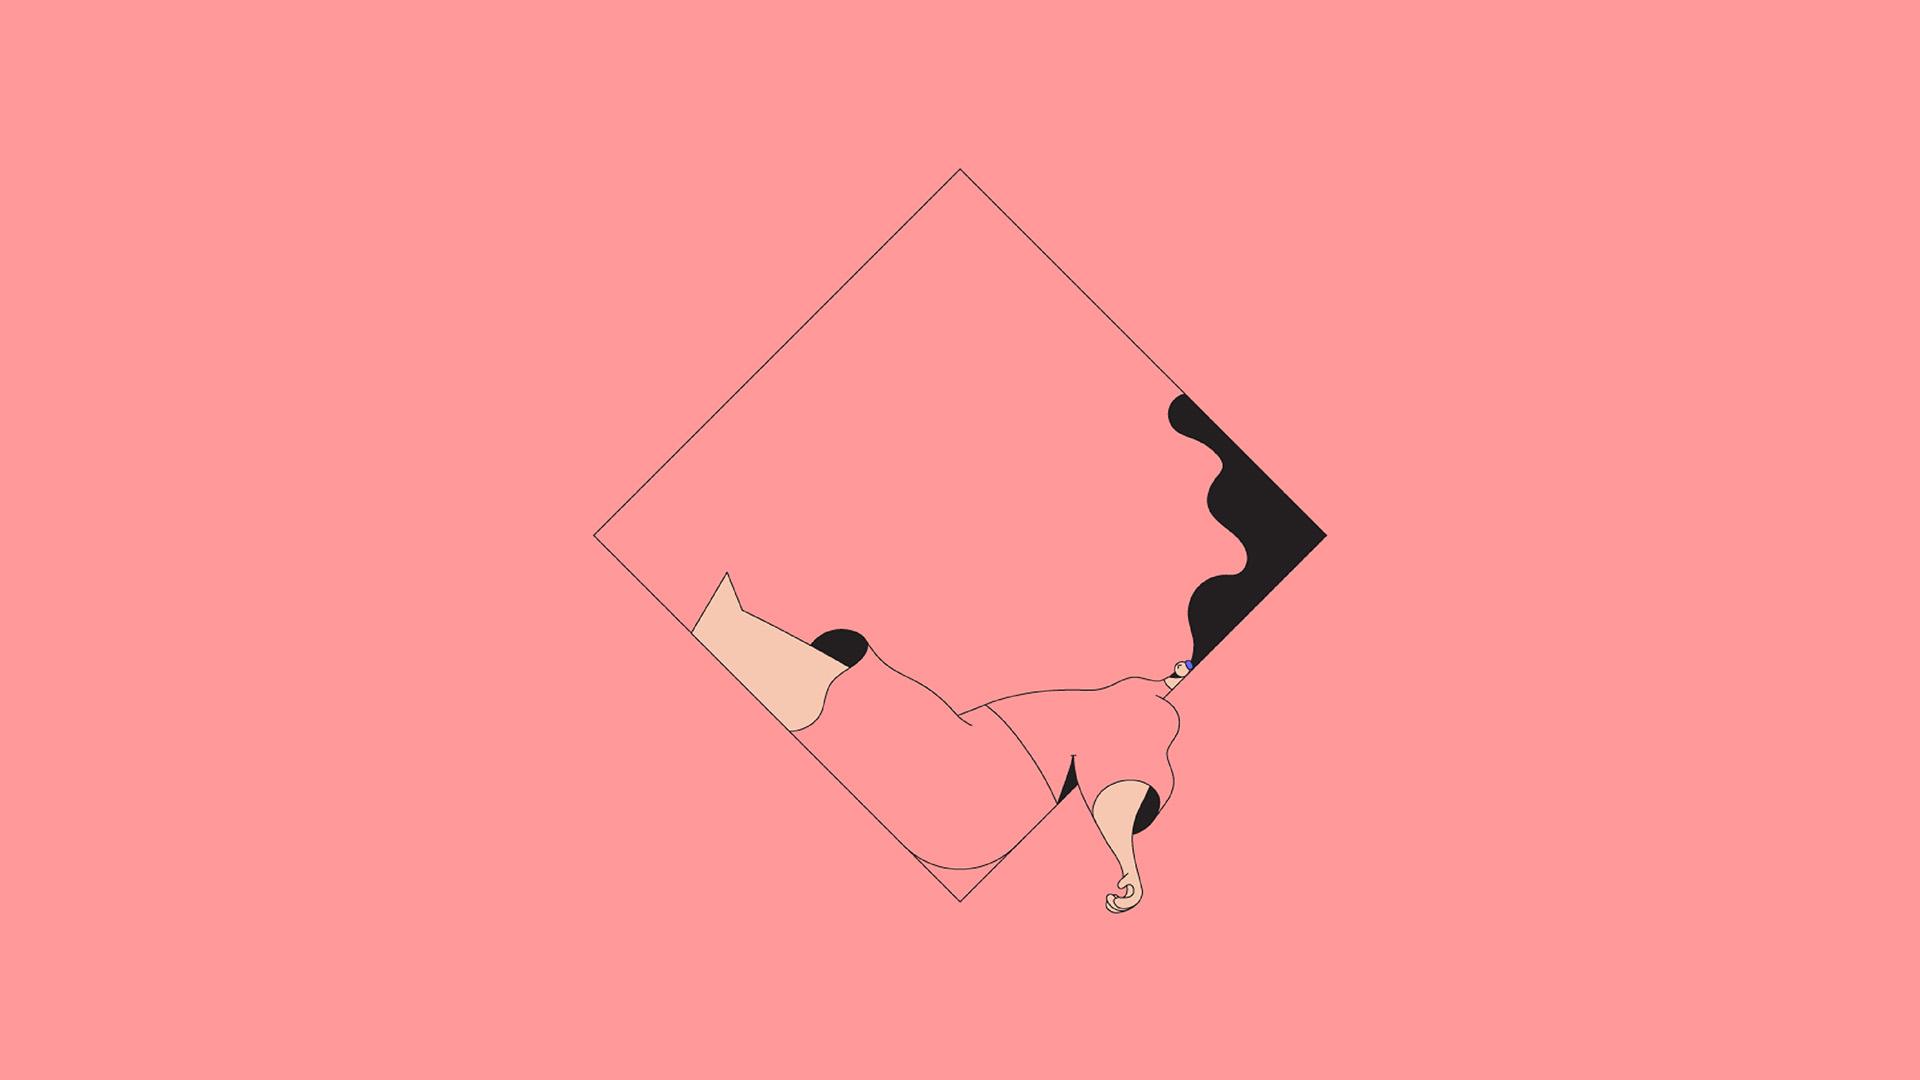 Pink Cute Wallpaper For Iphone Bb08 Minimal Drawing Pink Illustration Art Wallpaper